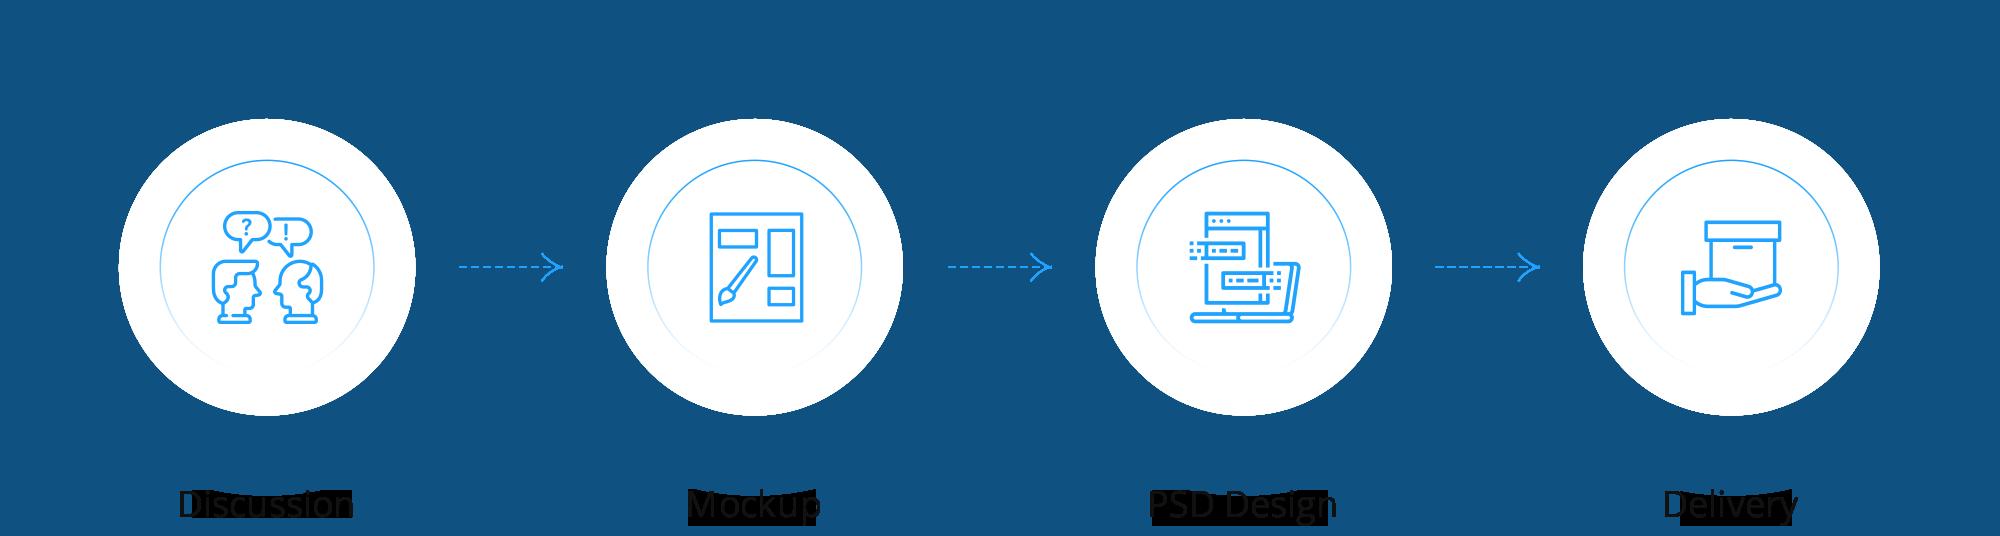 UI/UX Design Process